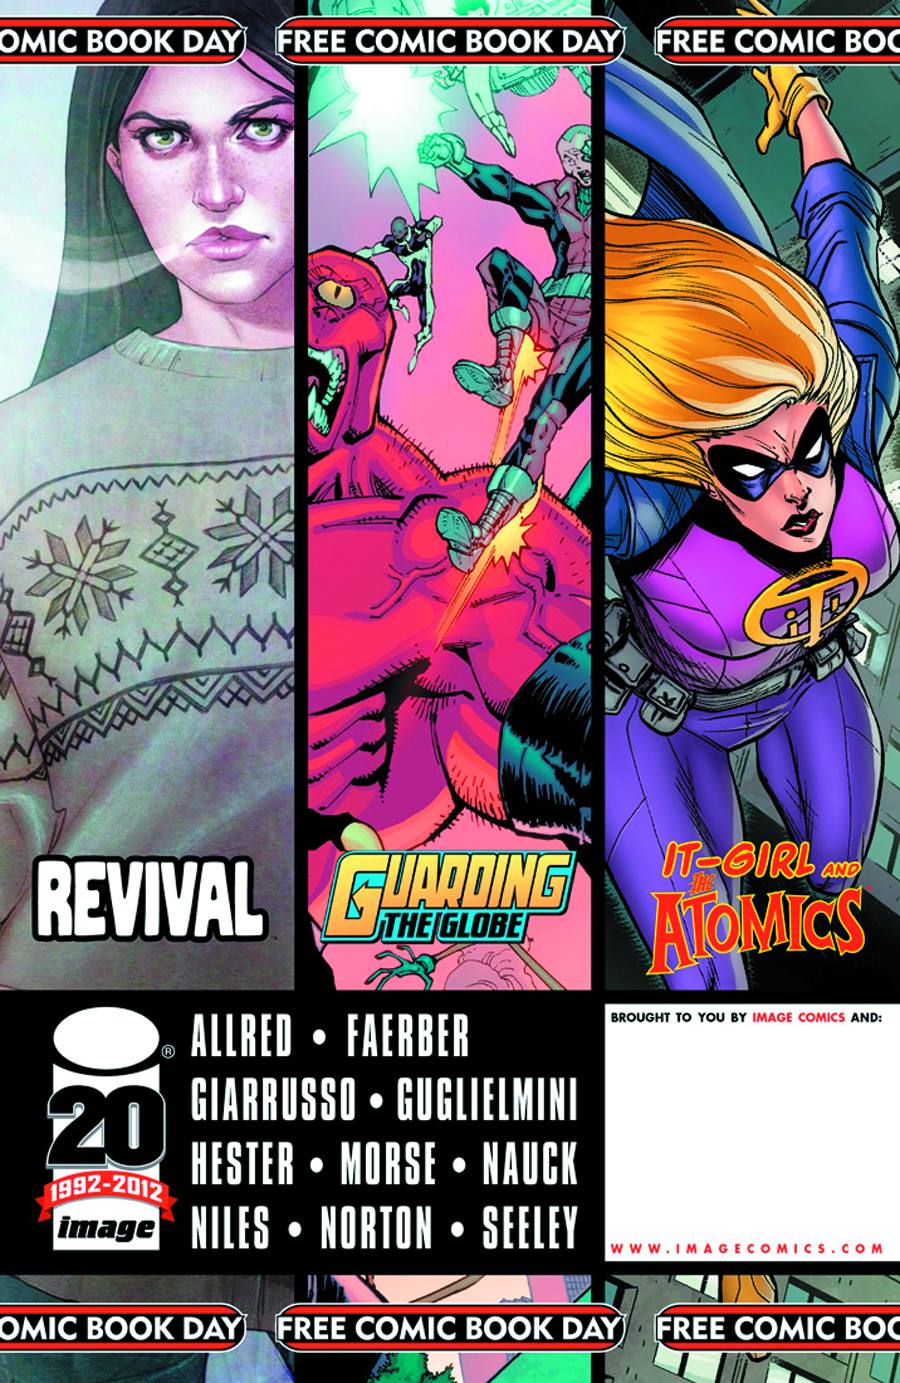 STK460687 Free Comic Book Day 2012: Reviews!